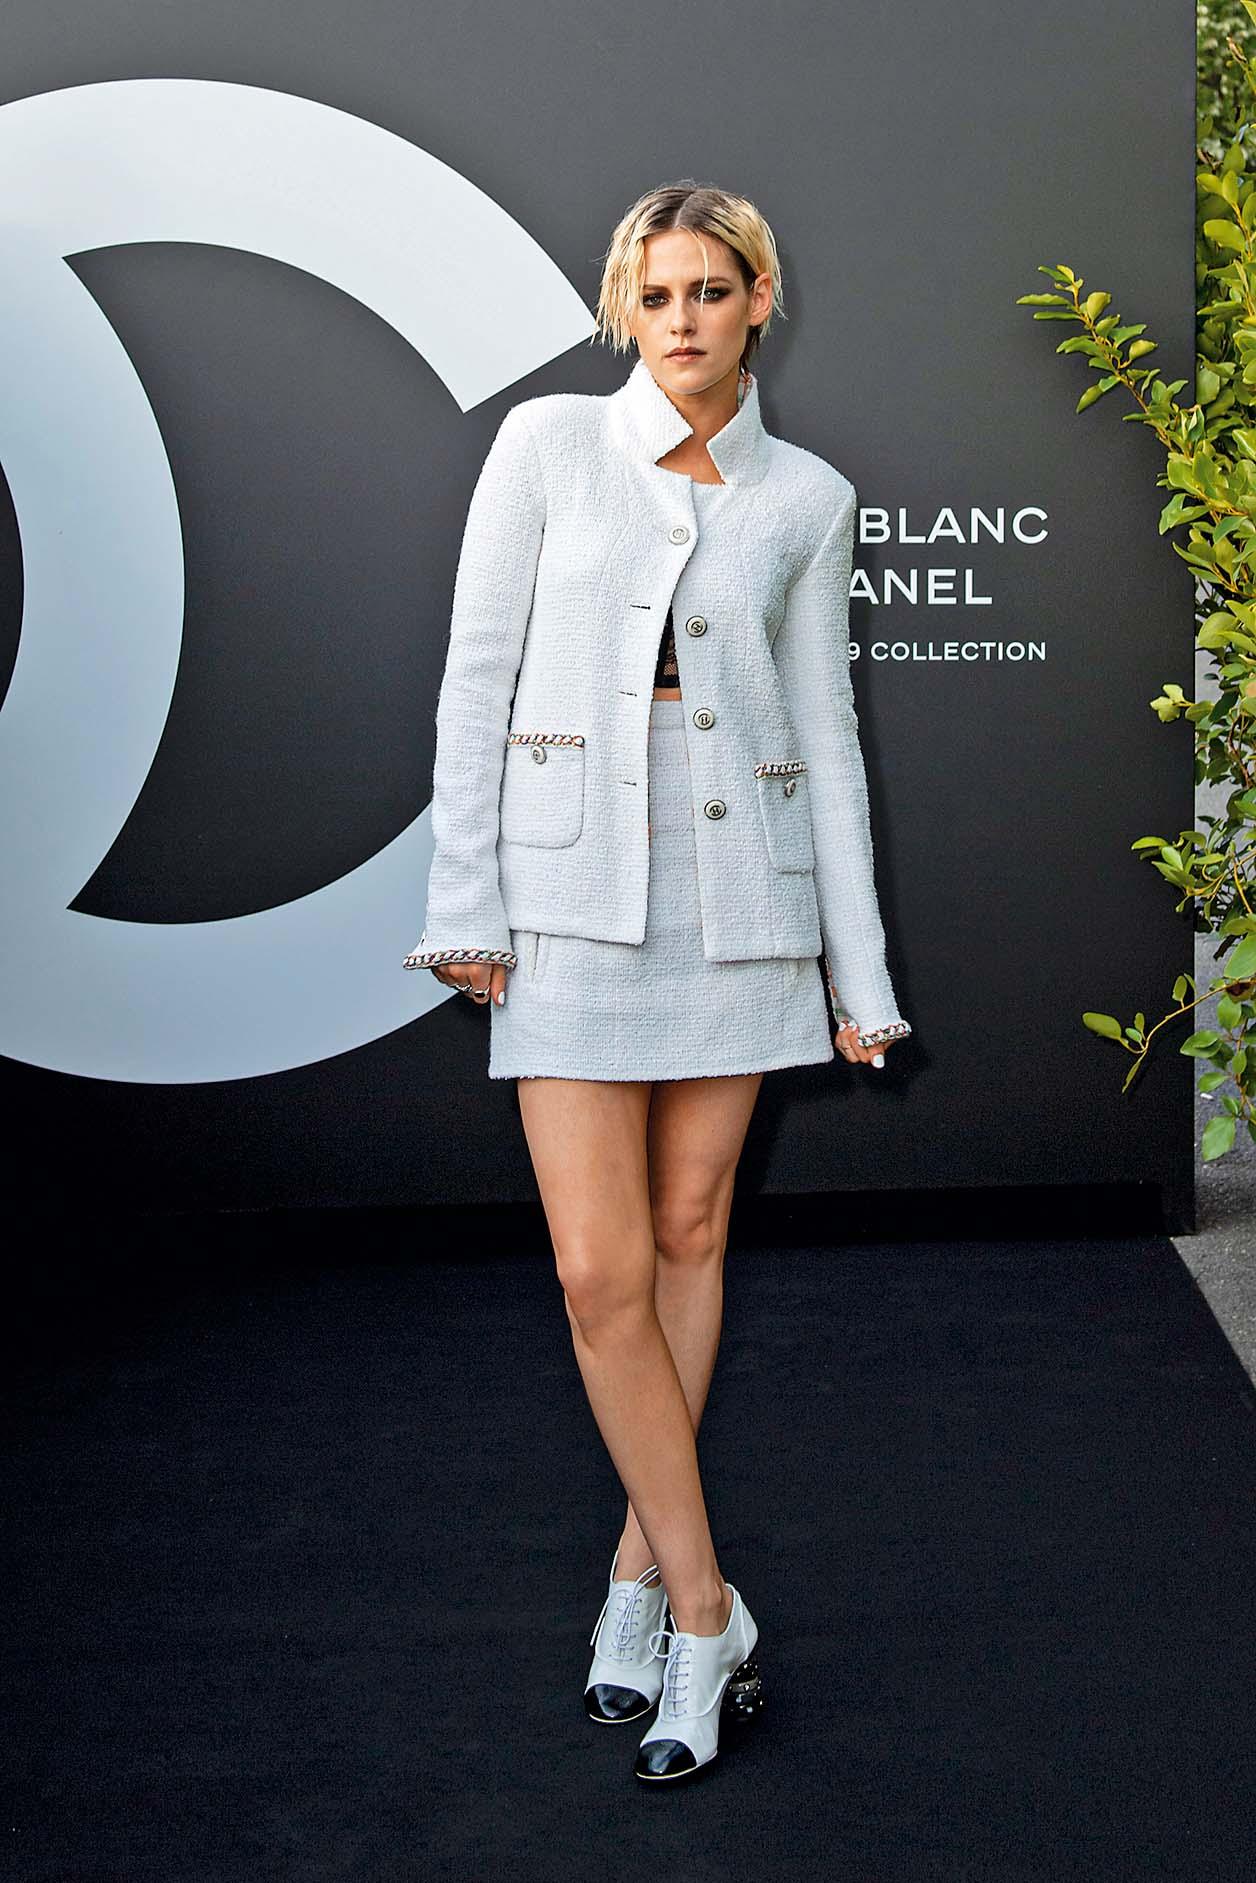 PARIS, FRANCE - JULY 11: Kristen Stewart attends the Noir et Blanc de Chanel Fall/Winter 2019 Makeup Collection - Yachts De Paris on July 11, 2019 in Paris, France. (Photo by Kristy Sparow/Getty Images for Chanel)